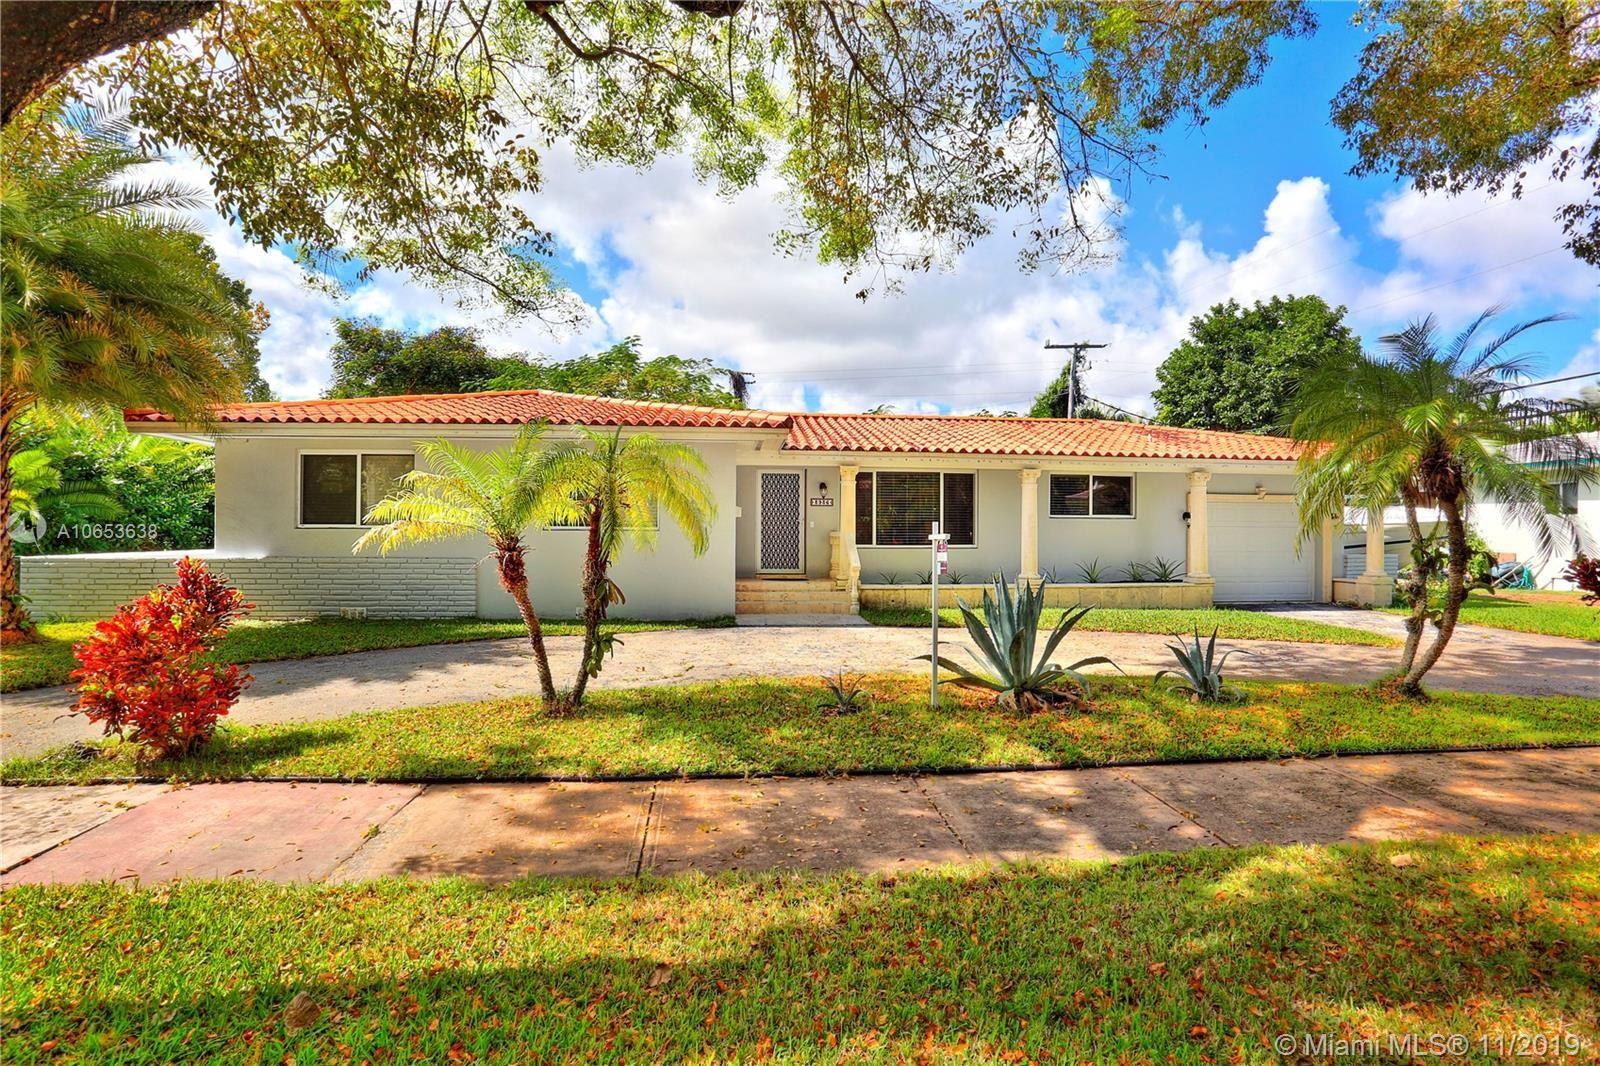 3936 Palmarito St, Coral Gables, FL 33134 - MLS#: A10653638